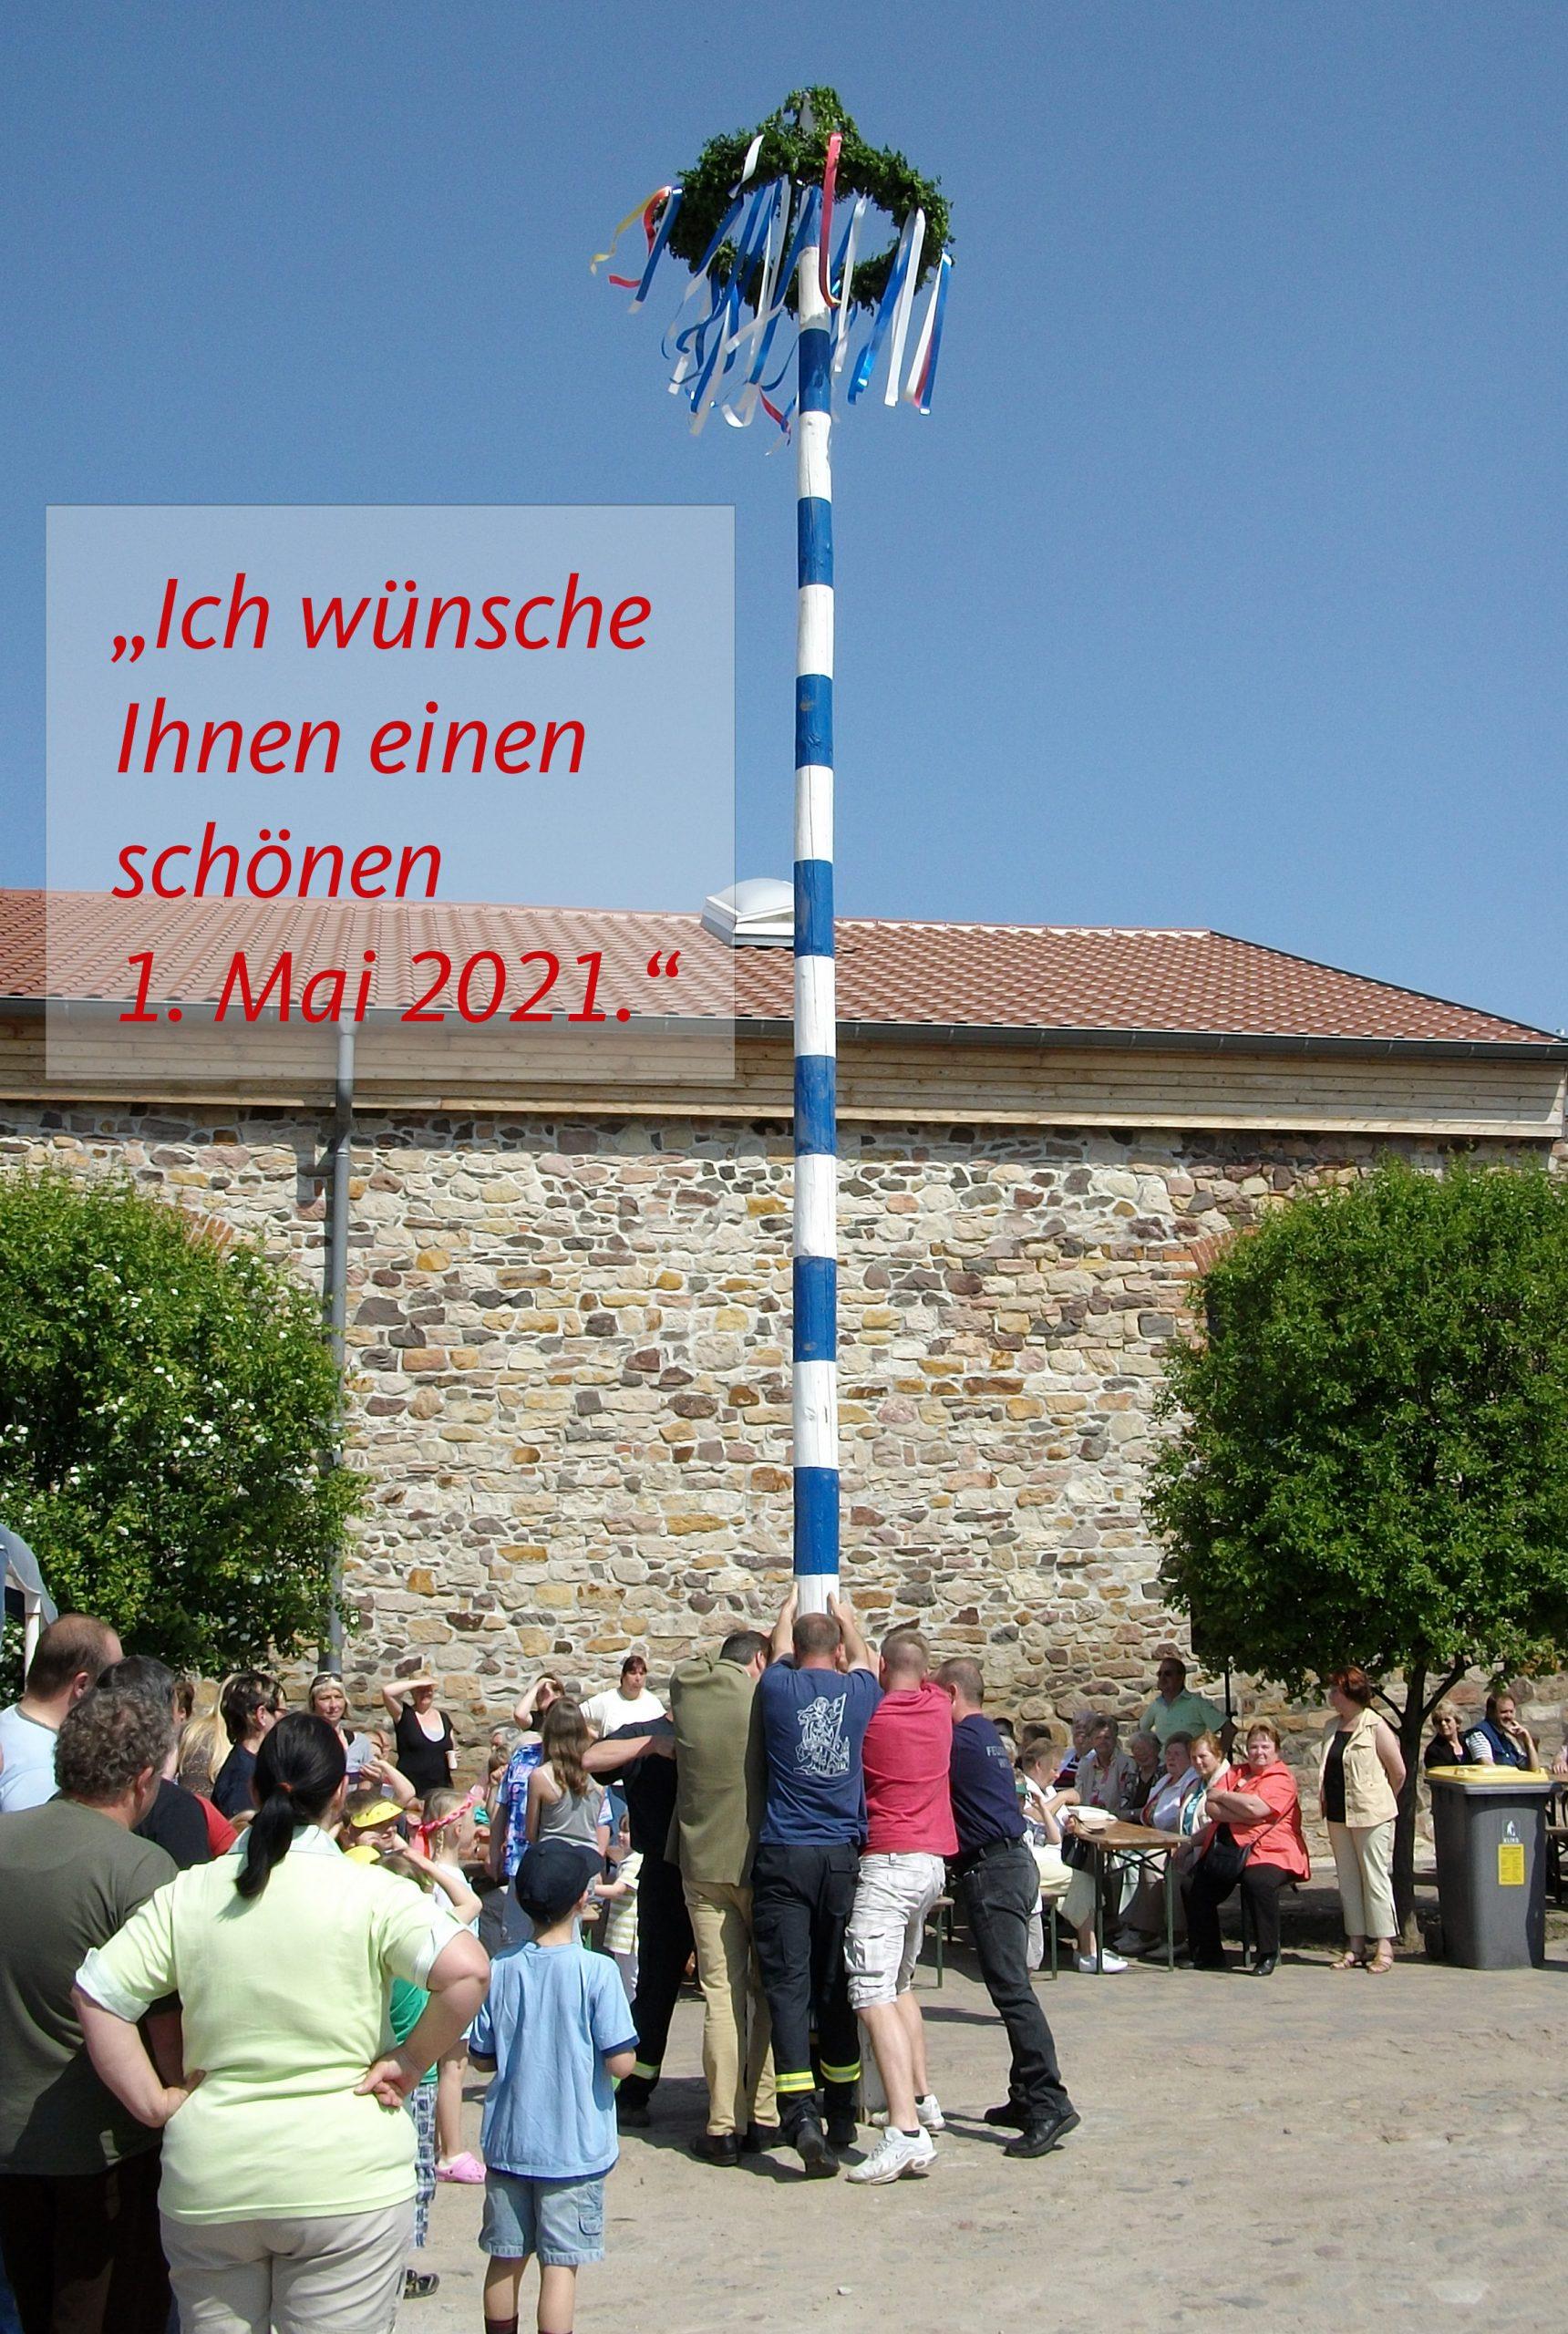 Holger Stahlknecht - Grüße zum 1. Mai